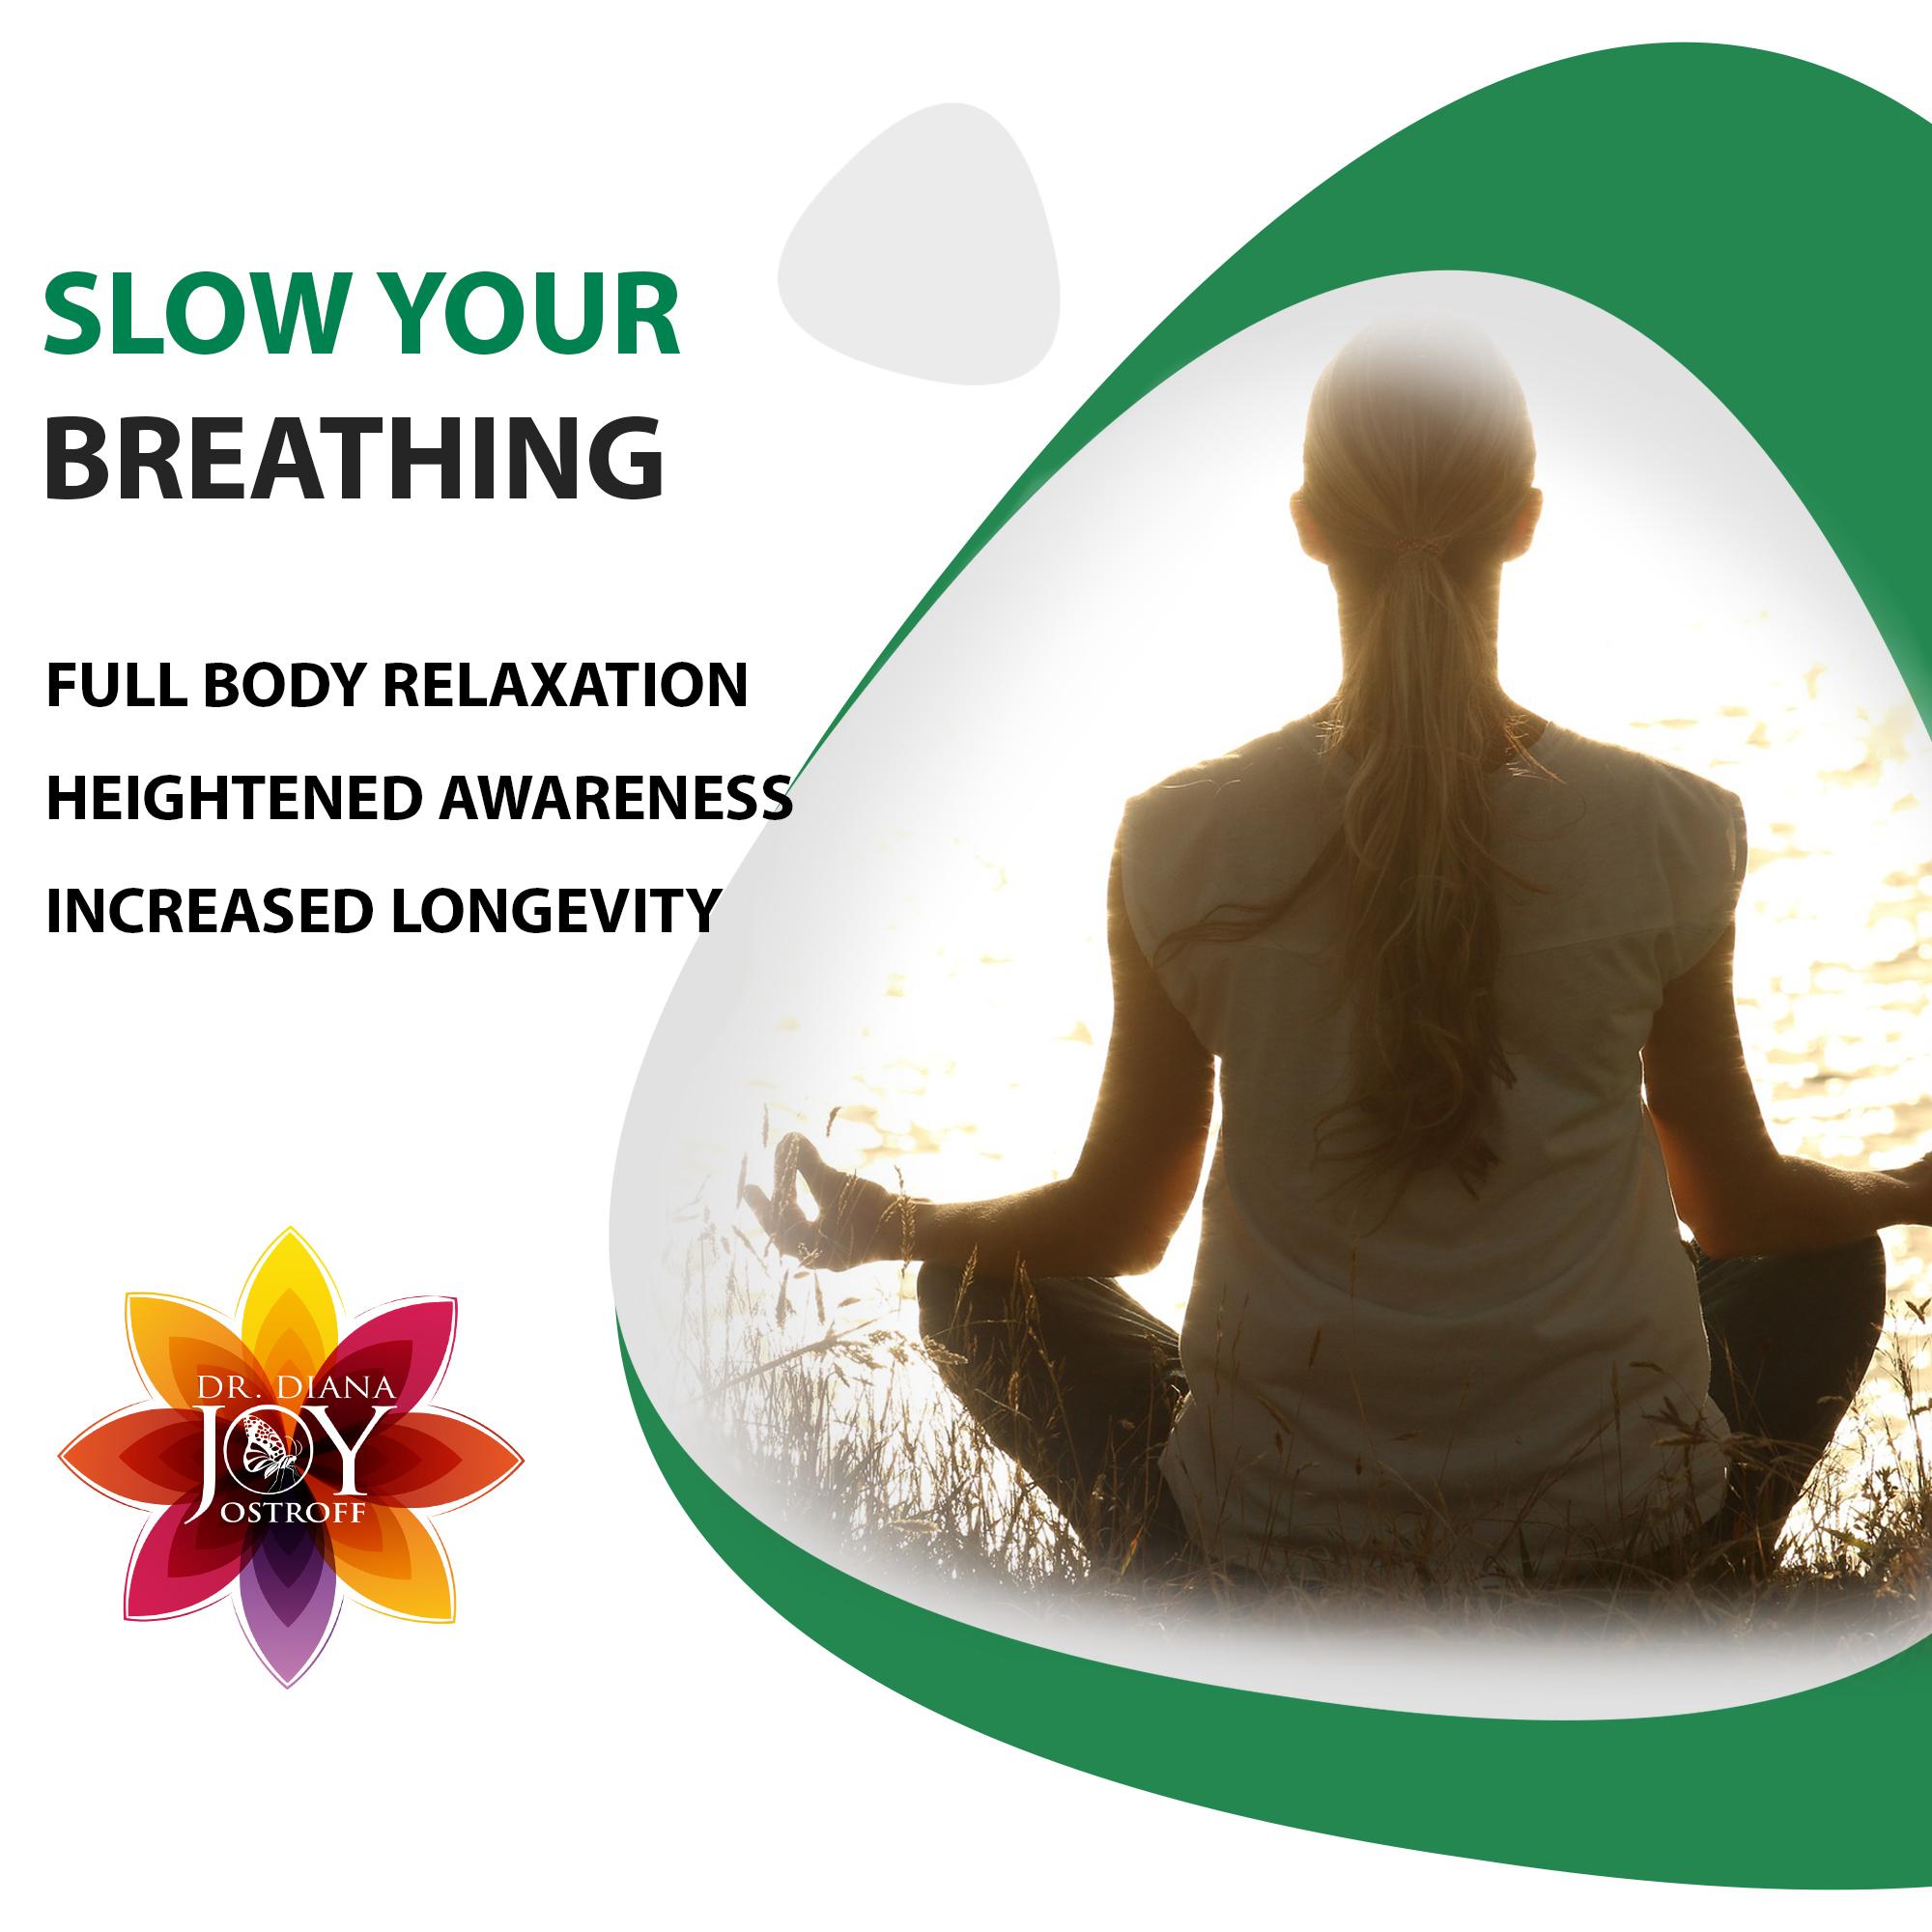 slow your breathing for longevity